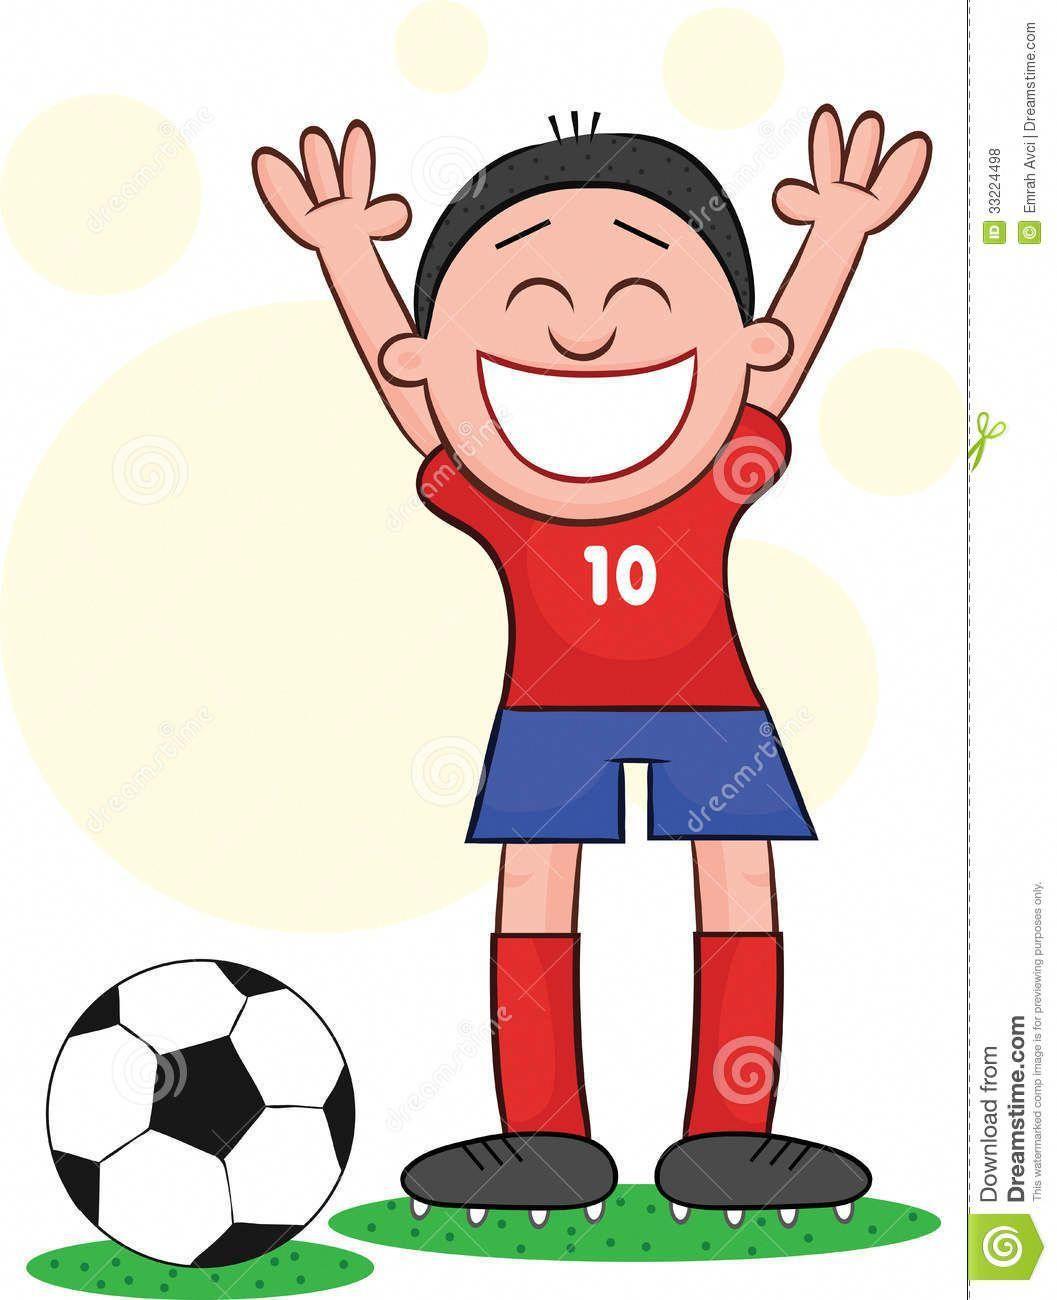 Footballer Cartoon Cartoon Soccer Player Happy Royalty Free Stock Photos Image Soccer Players Free Stock Photos Image Royalty Free Stock Photos